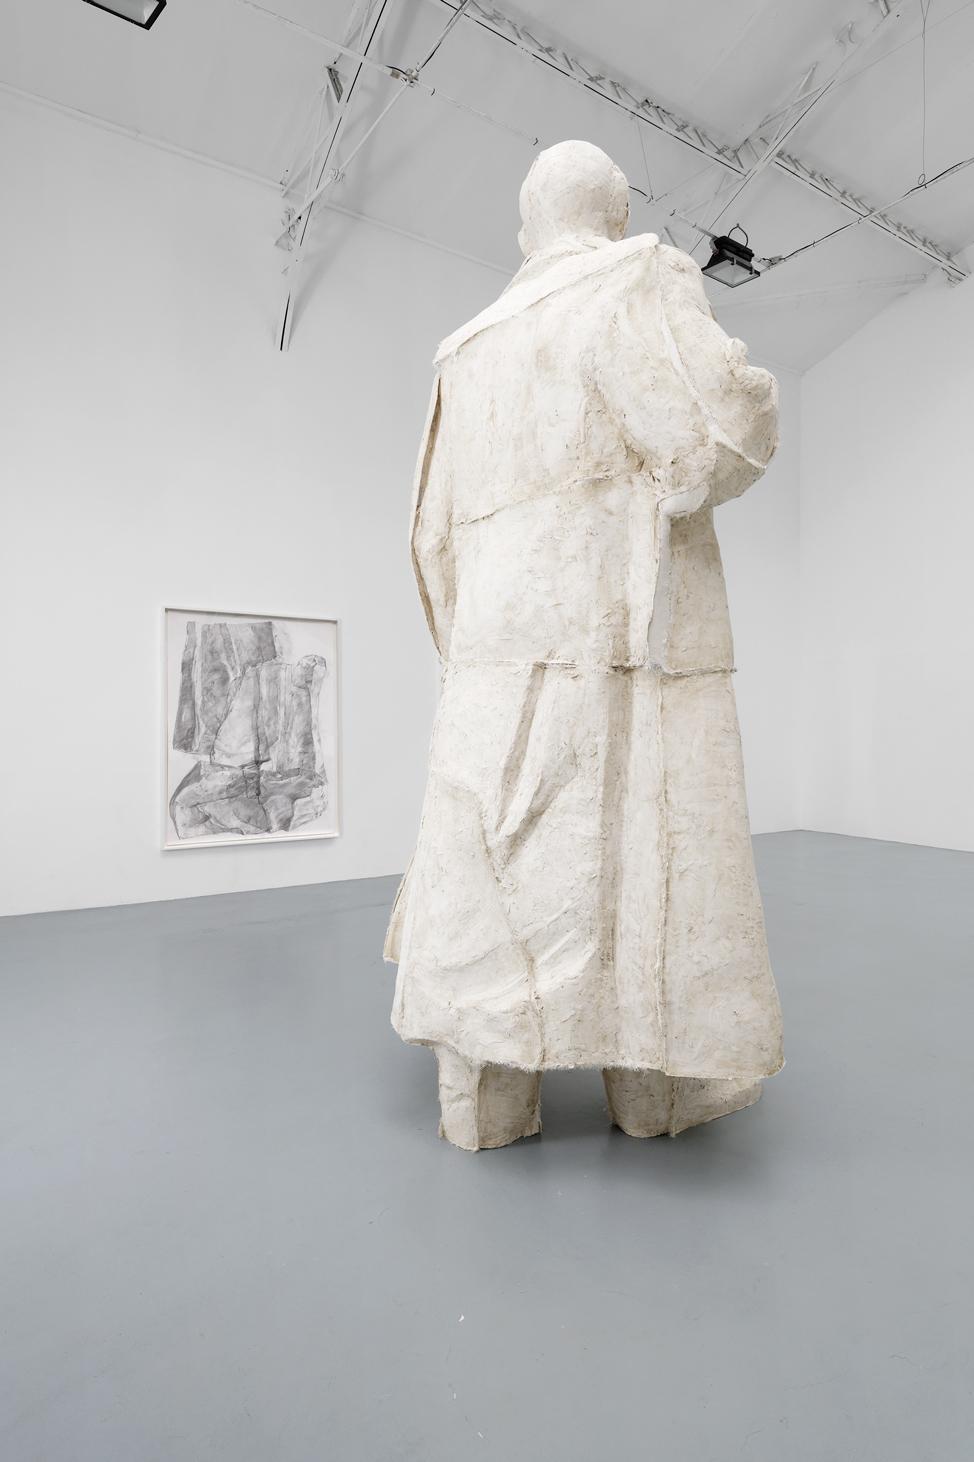 Incarnation, Ciprian Mureșan, installation view, galerie Hussenot, Paris. — Galerie Éric Hussenot, Paris